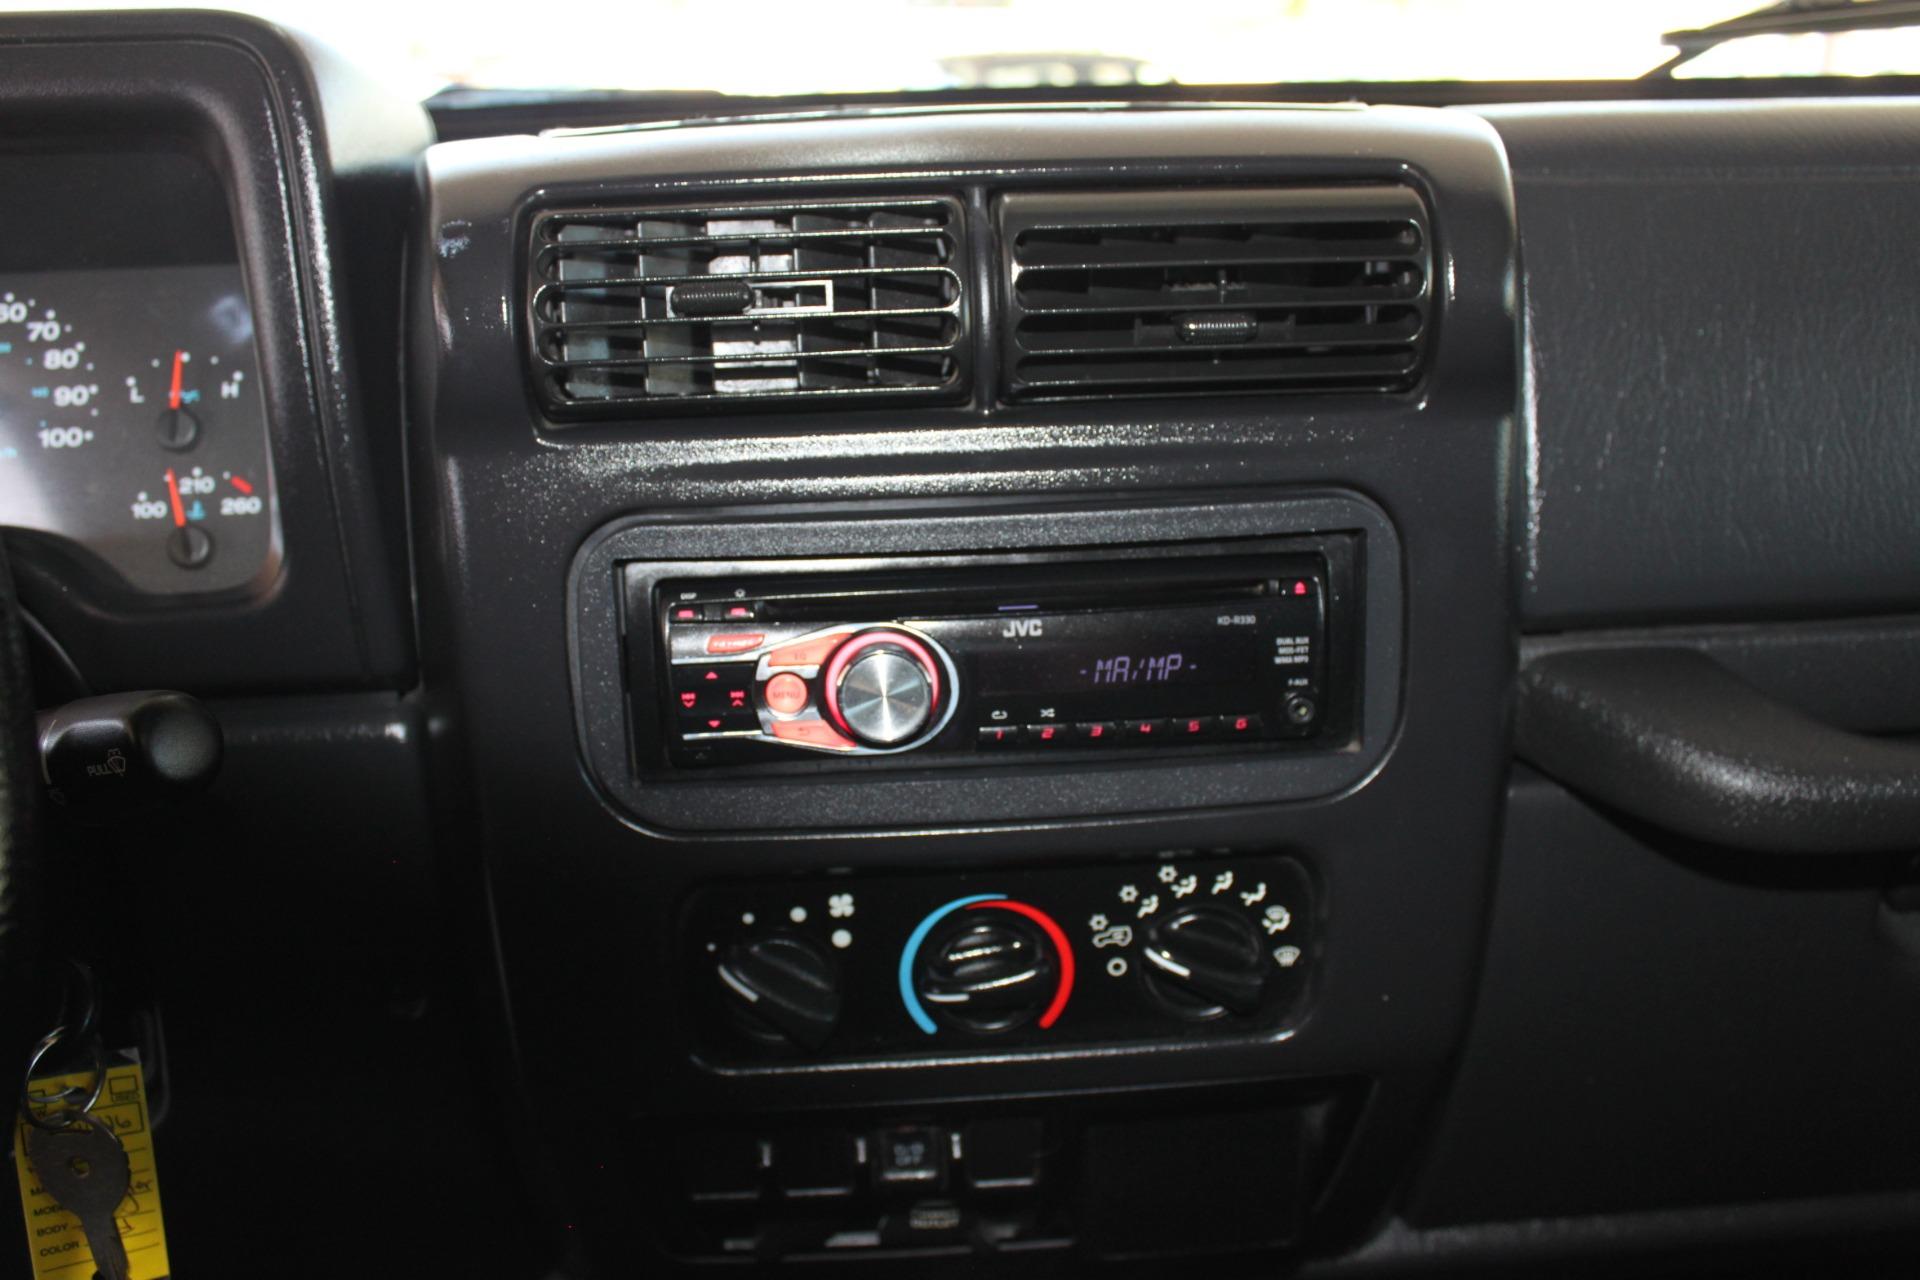 Used-2006-Jeep-Wrangler-Unlimited-LWB-Honda